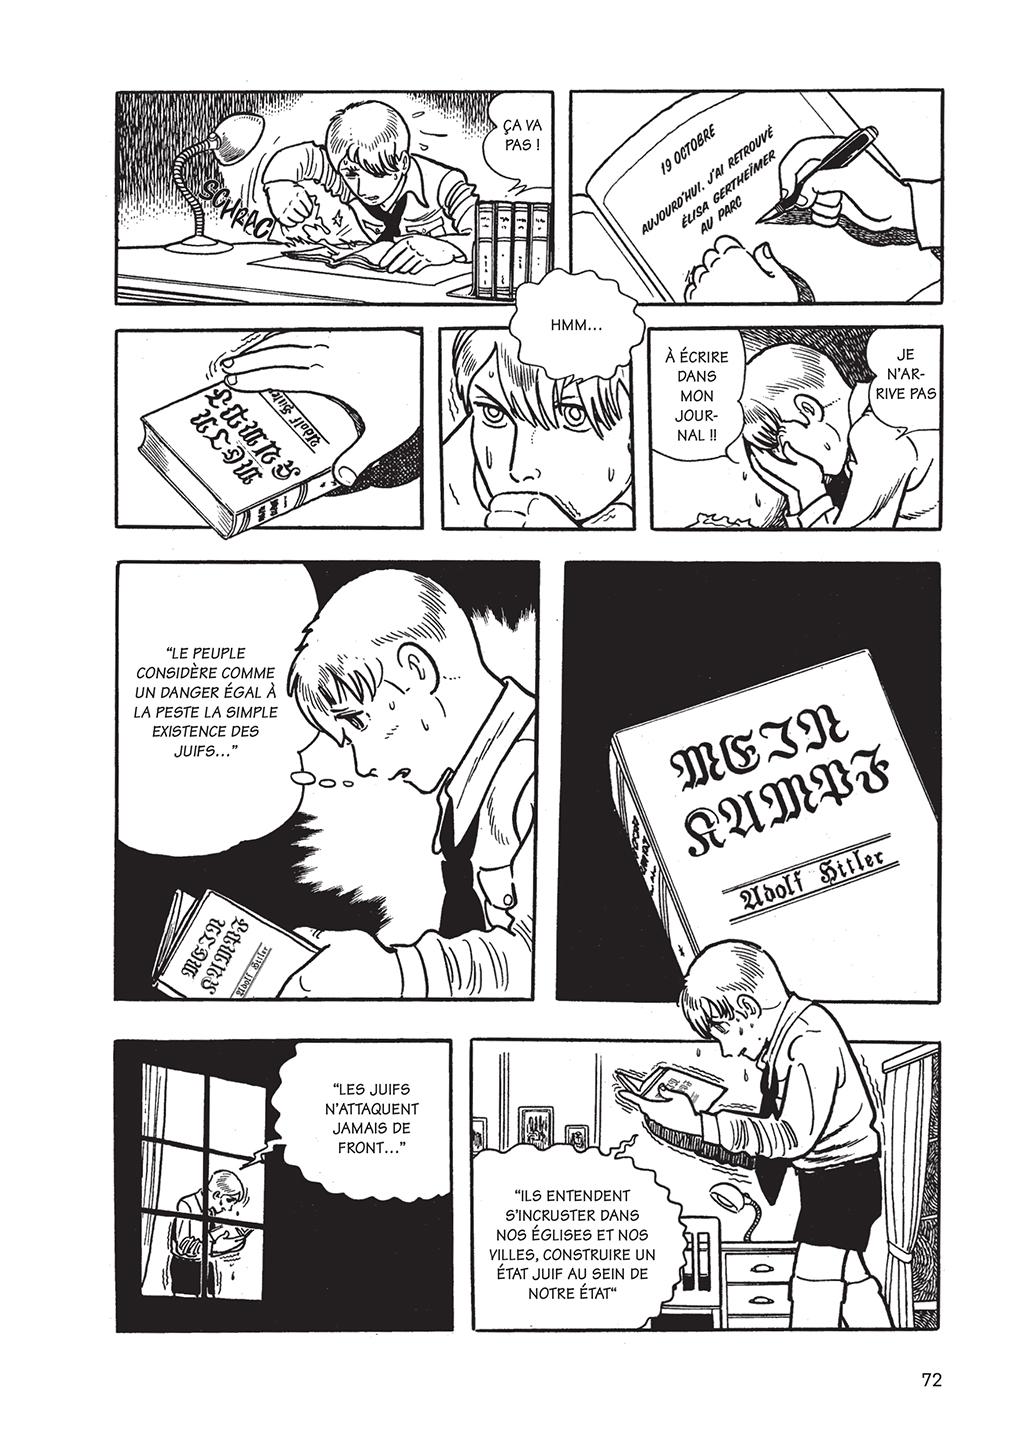 L'Histoire des 3 Adolf – Tome 2 – Osamu Tezuka – © Éditions Delcourt/Tonkam, 2018 – © ADOLF NI TSUGU – © 2018 by TEZUKA PRODUCTIONS.